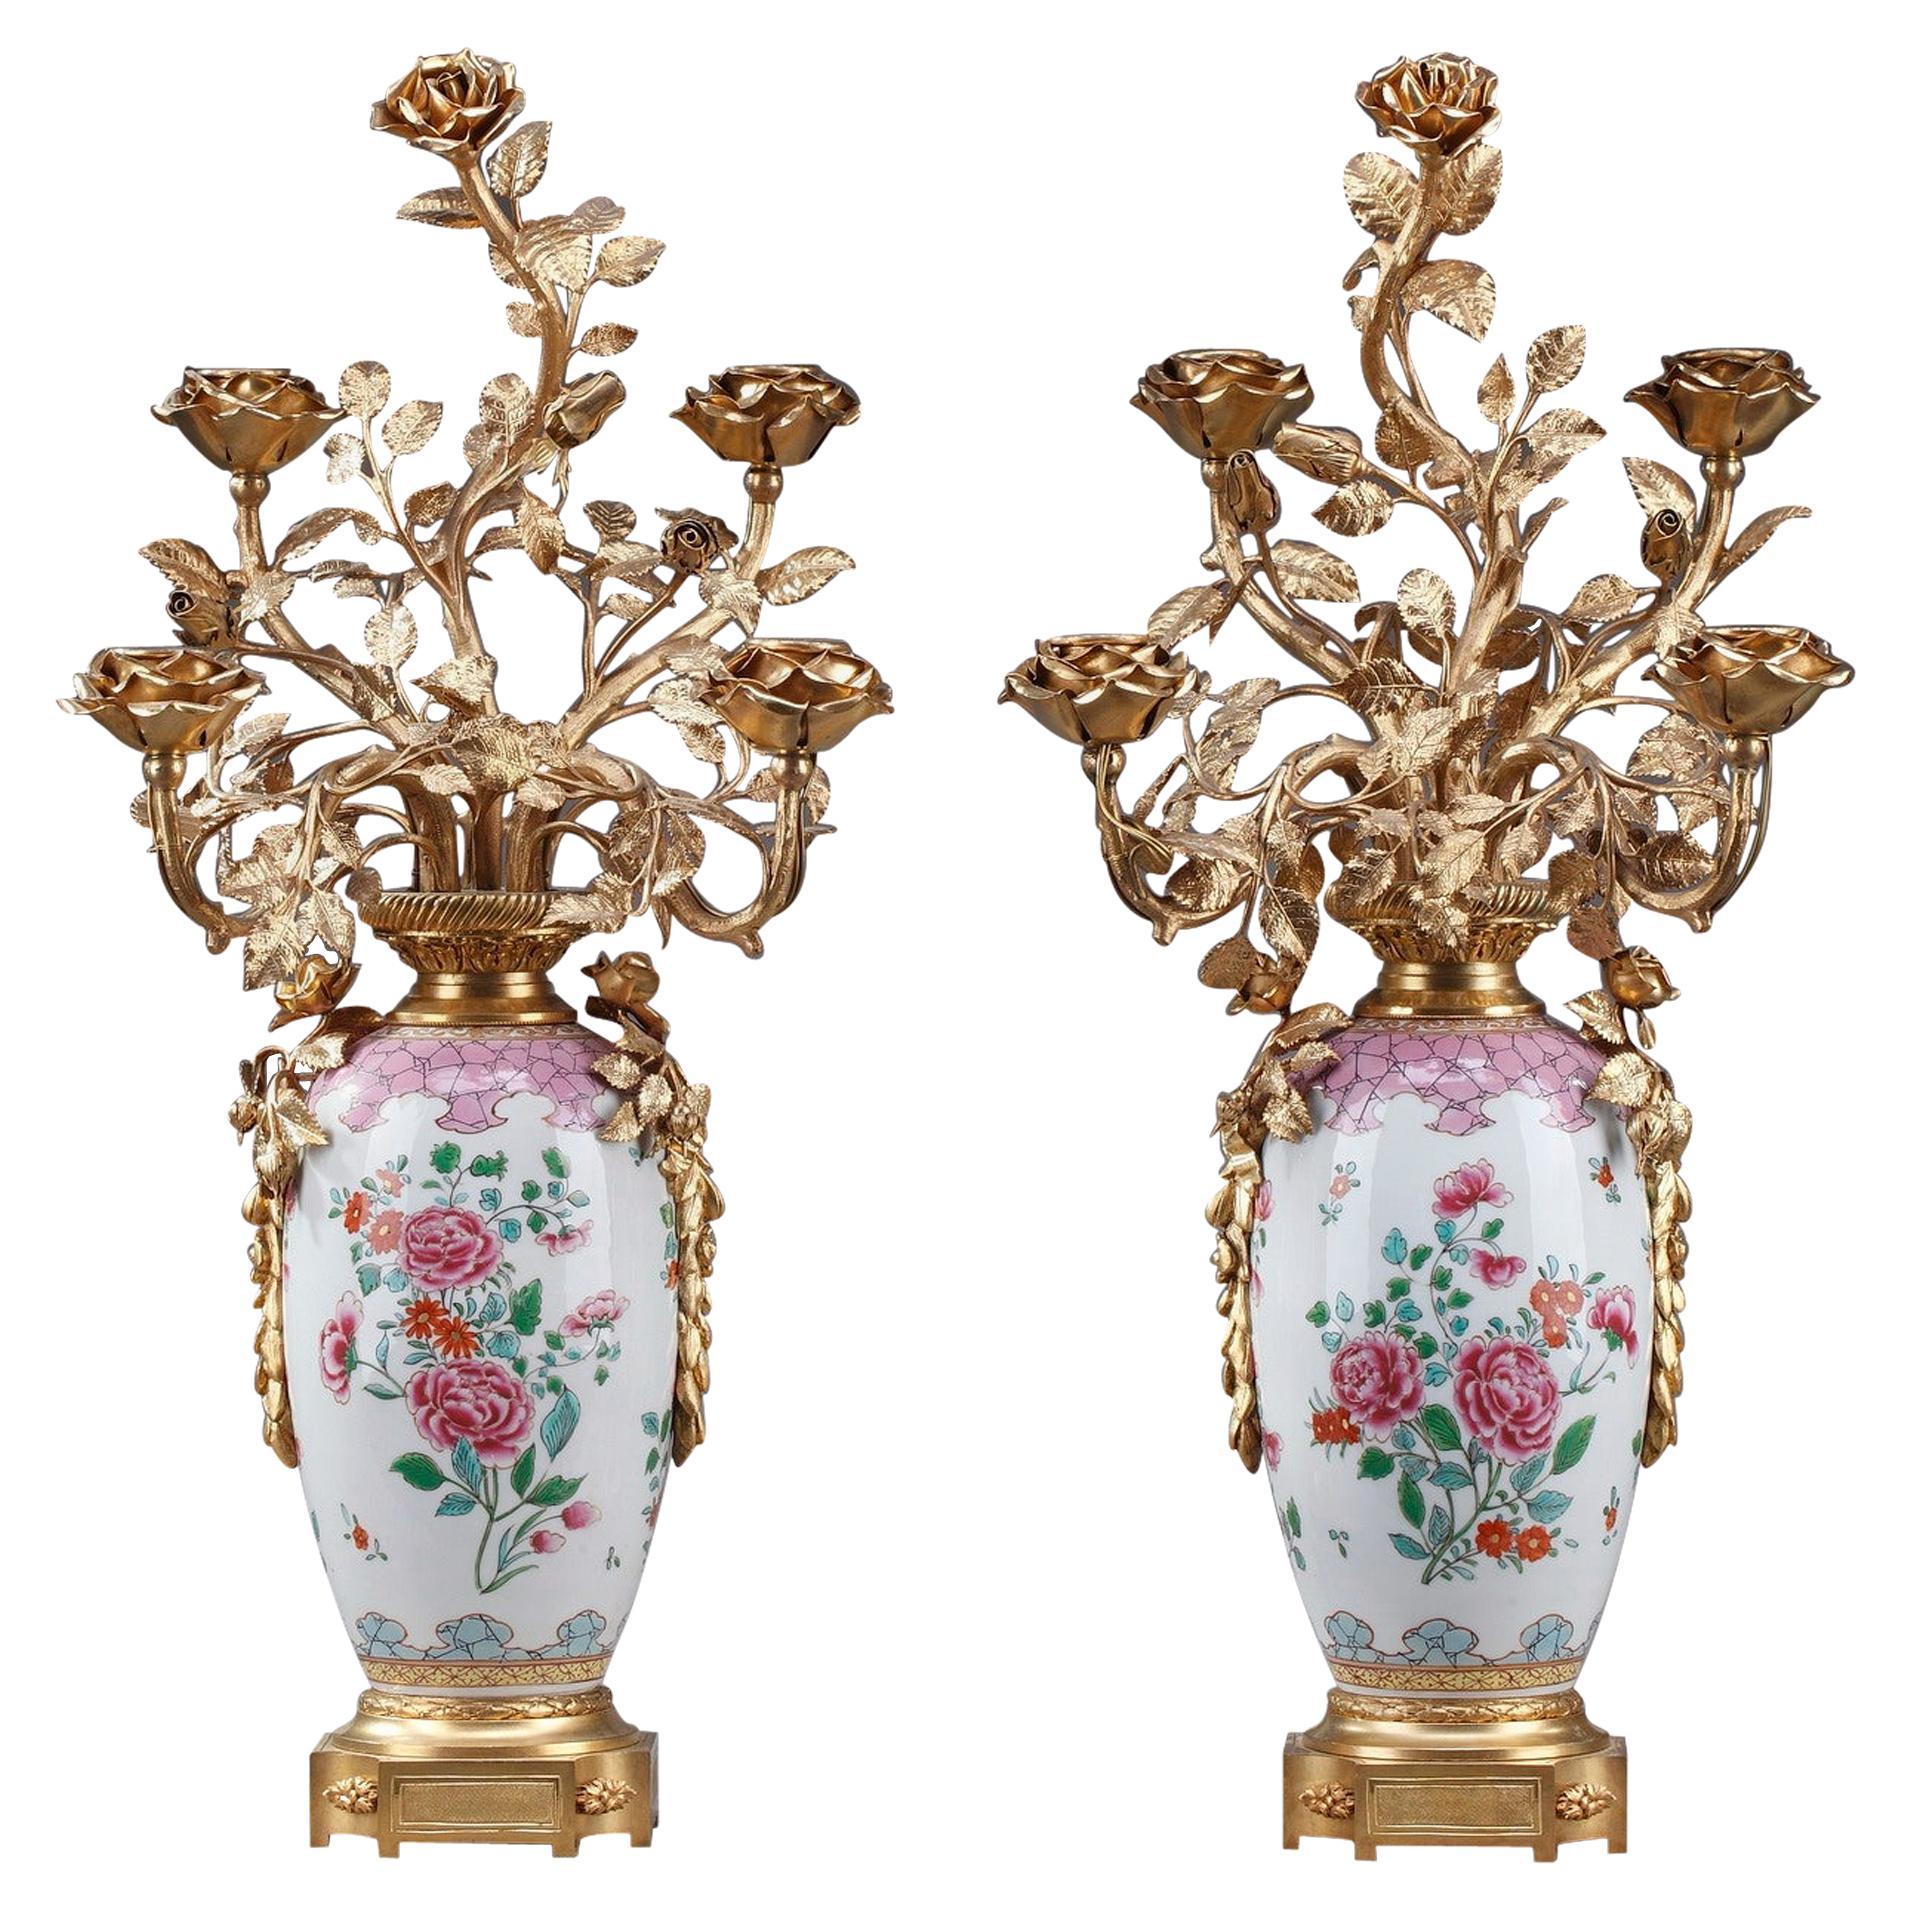 19th Century Vases Mounted as Lamps in Famille Rose Porcelain Taste